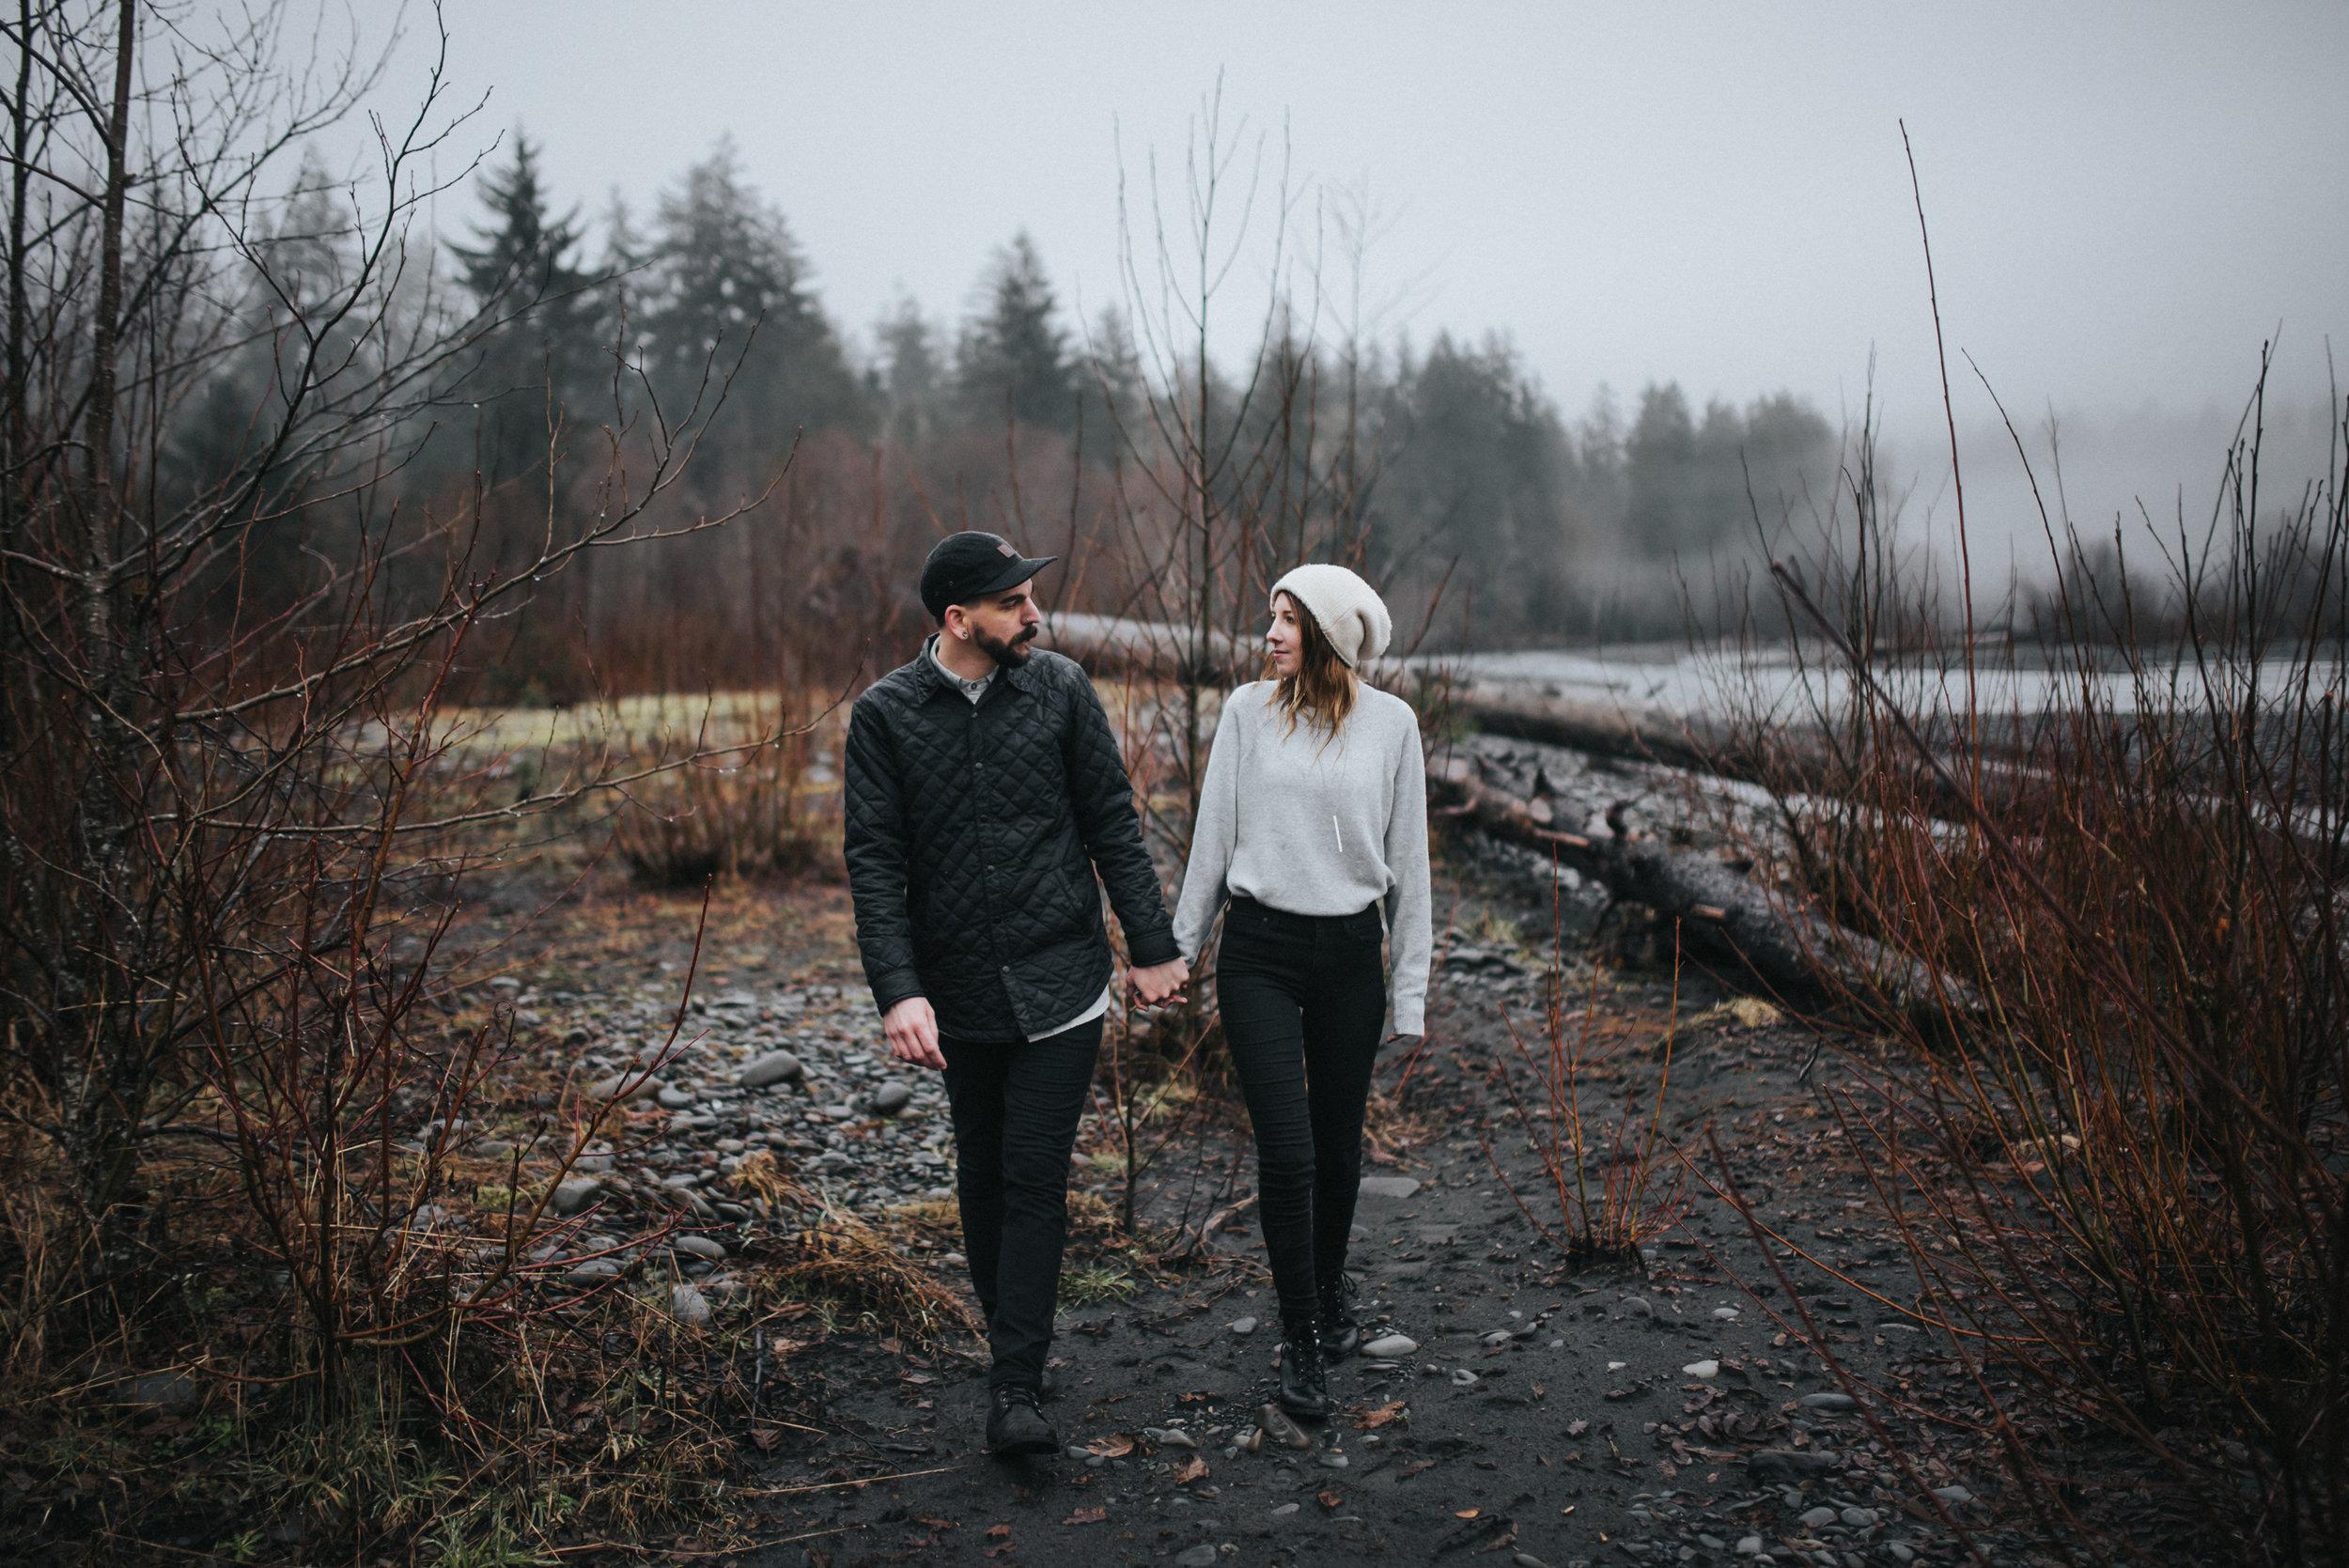 Engagement Session at the Hoh Rainforest in Washington   Katie + Matt